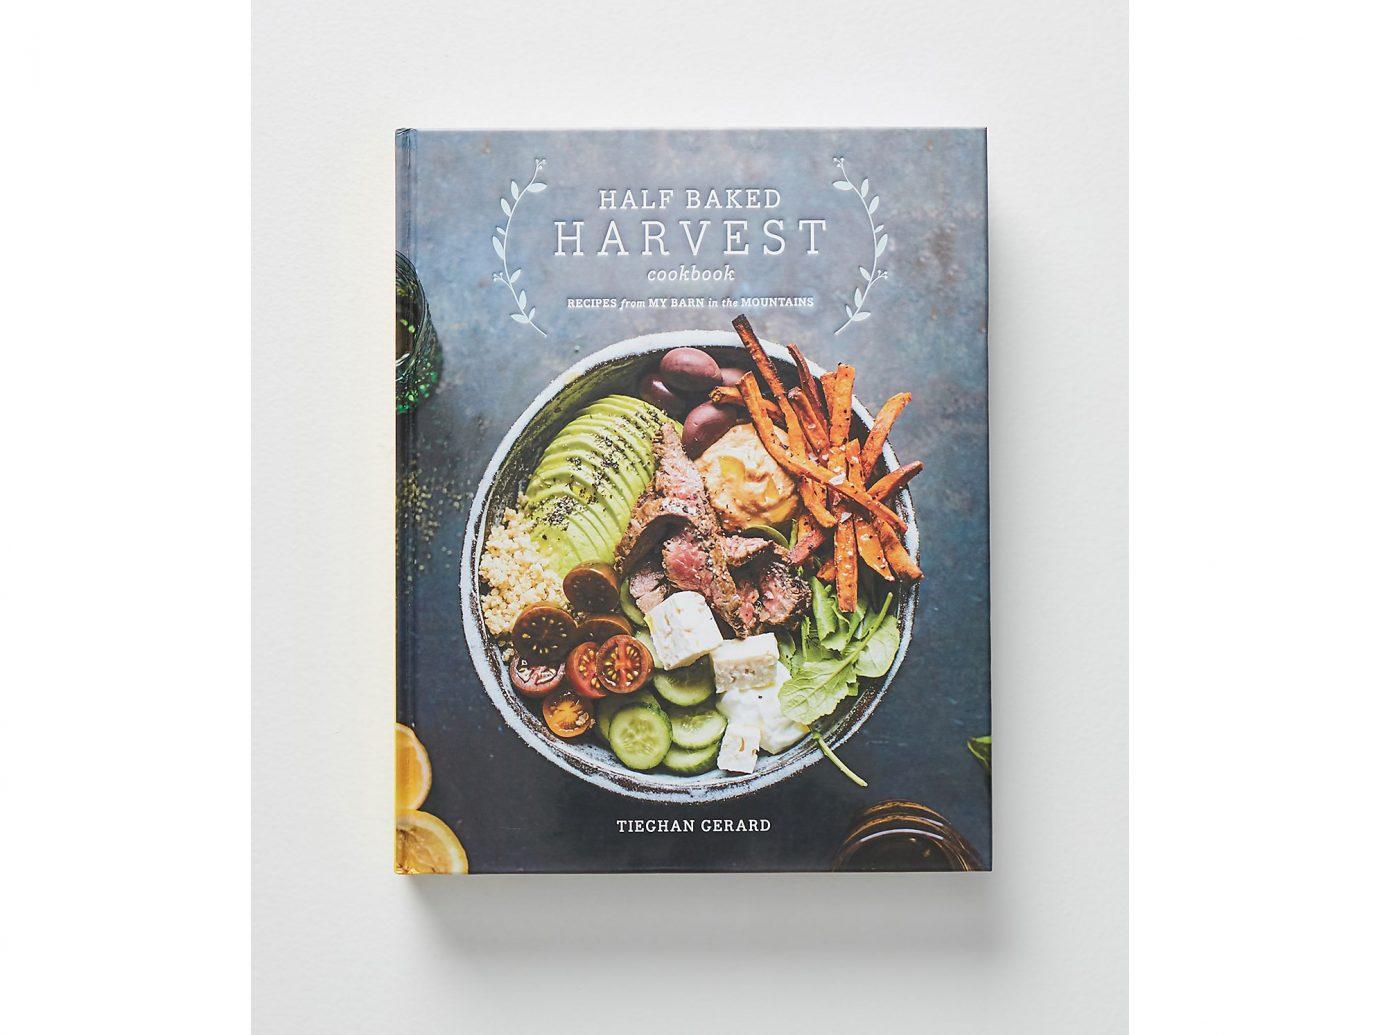 Cookbook: Half Baked Harvest Cookbook